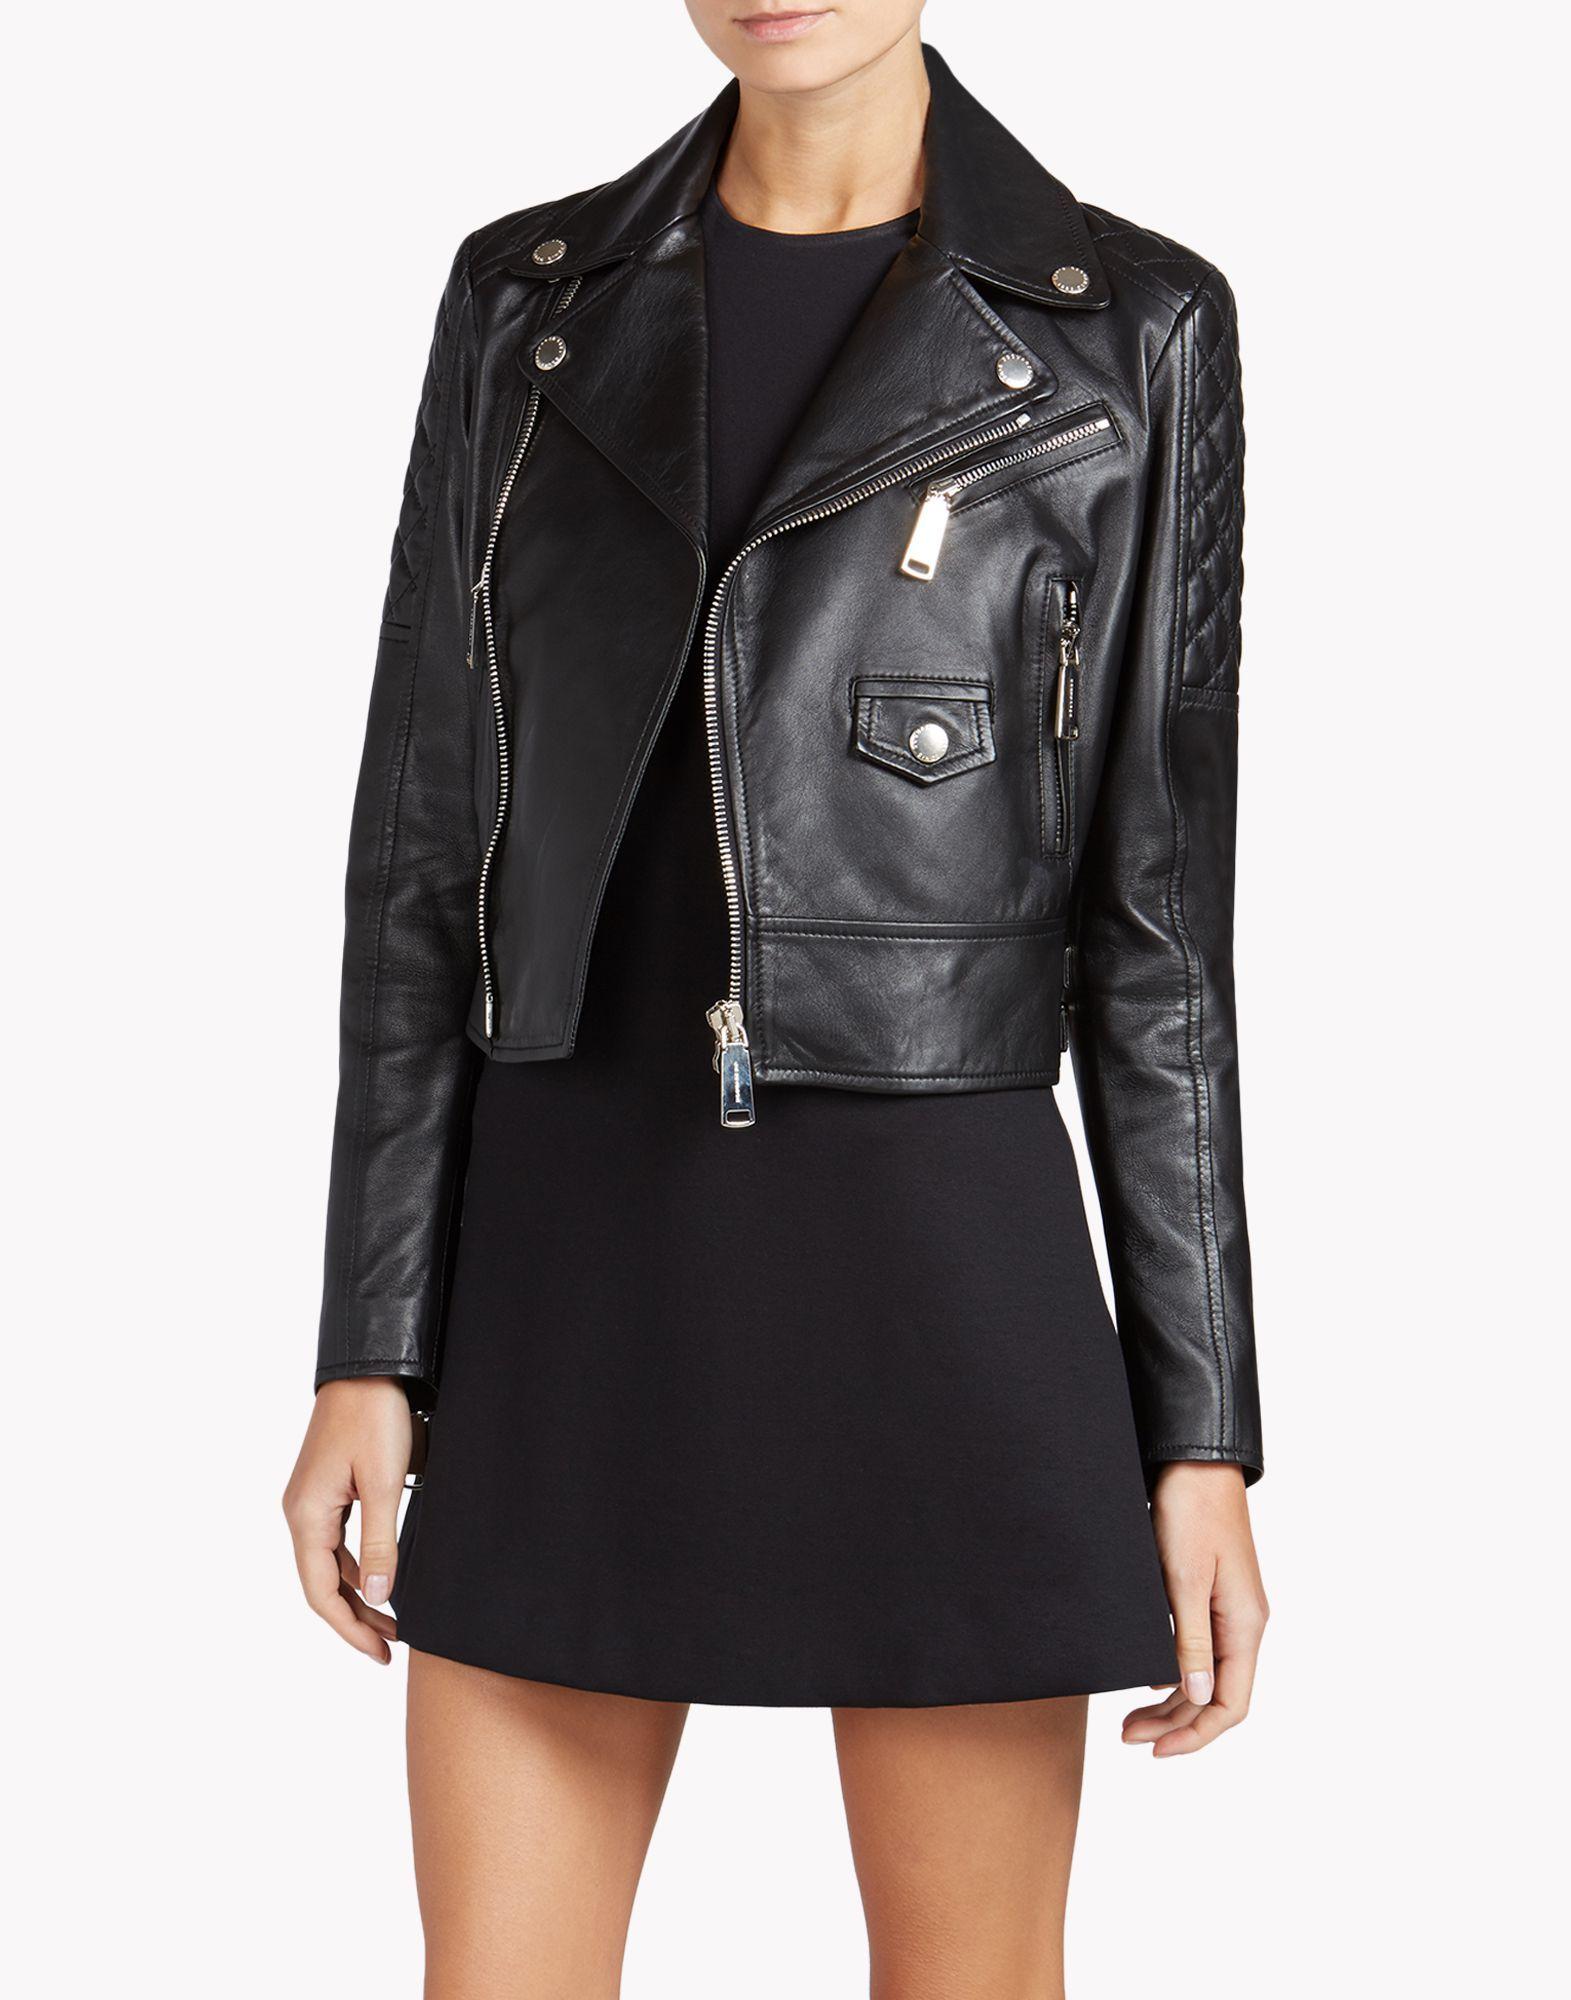 Online Dsquared2 Biker Store Women Jacket Leather Outerwear CqCwrpX